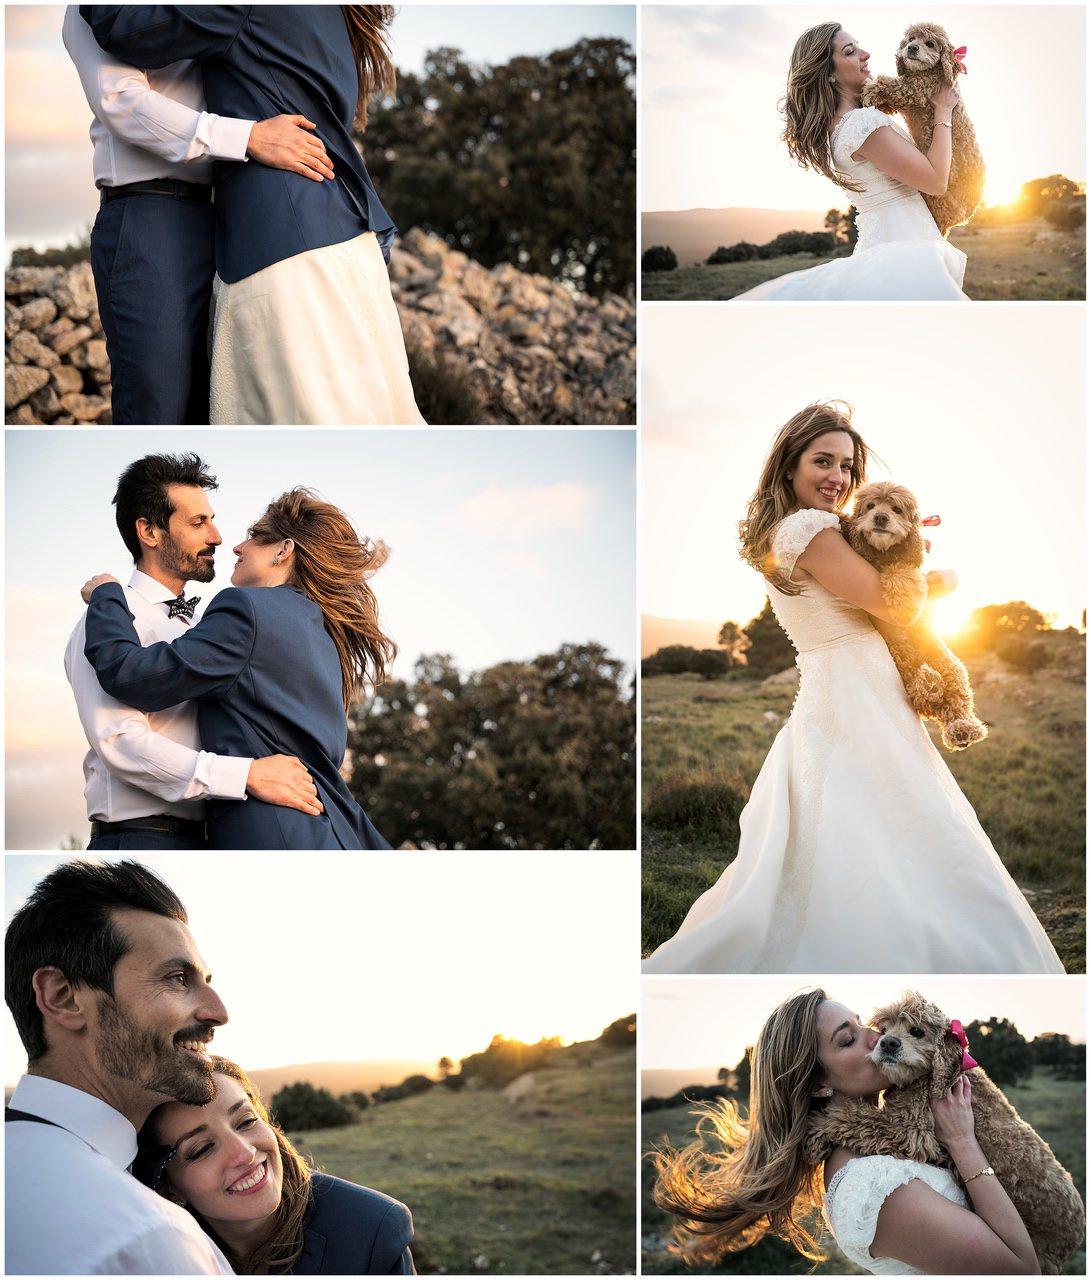 fotografo bodas alcoy noe ramon 5